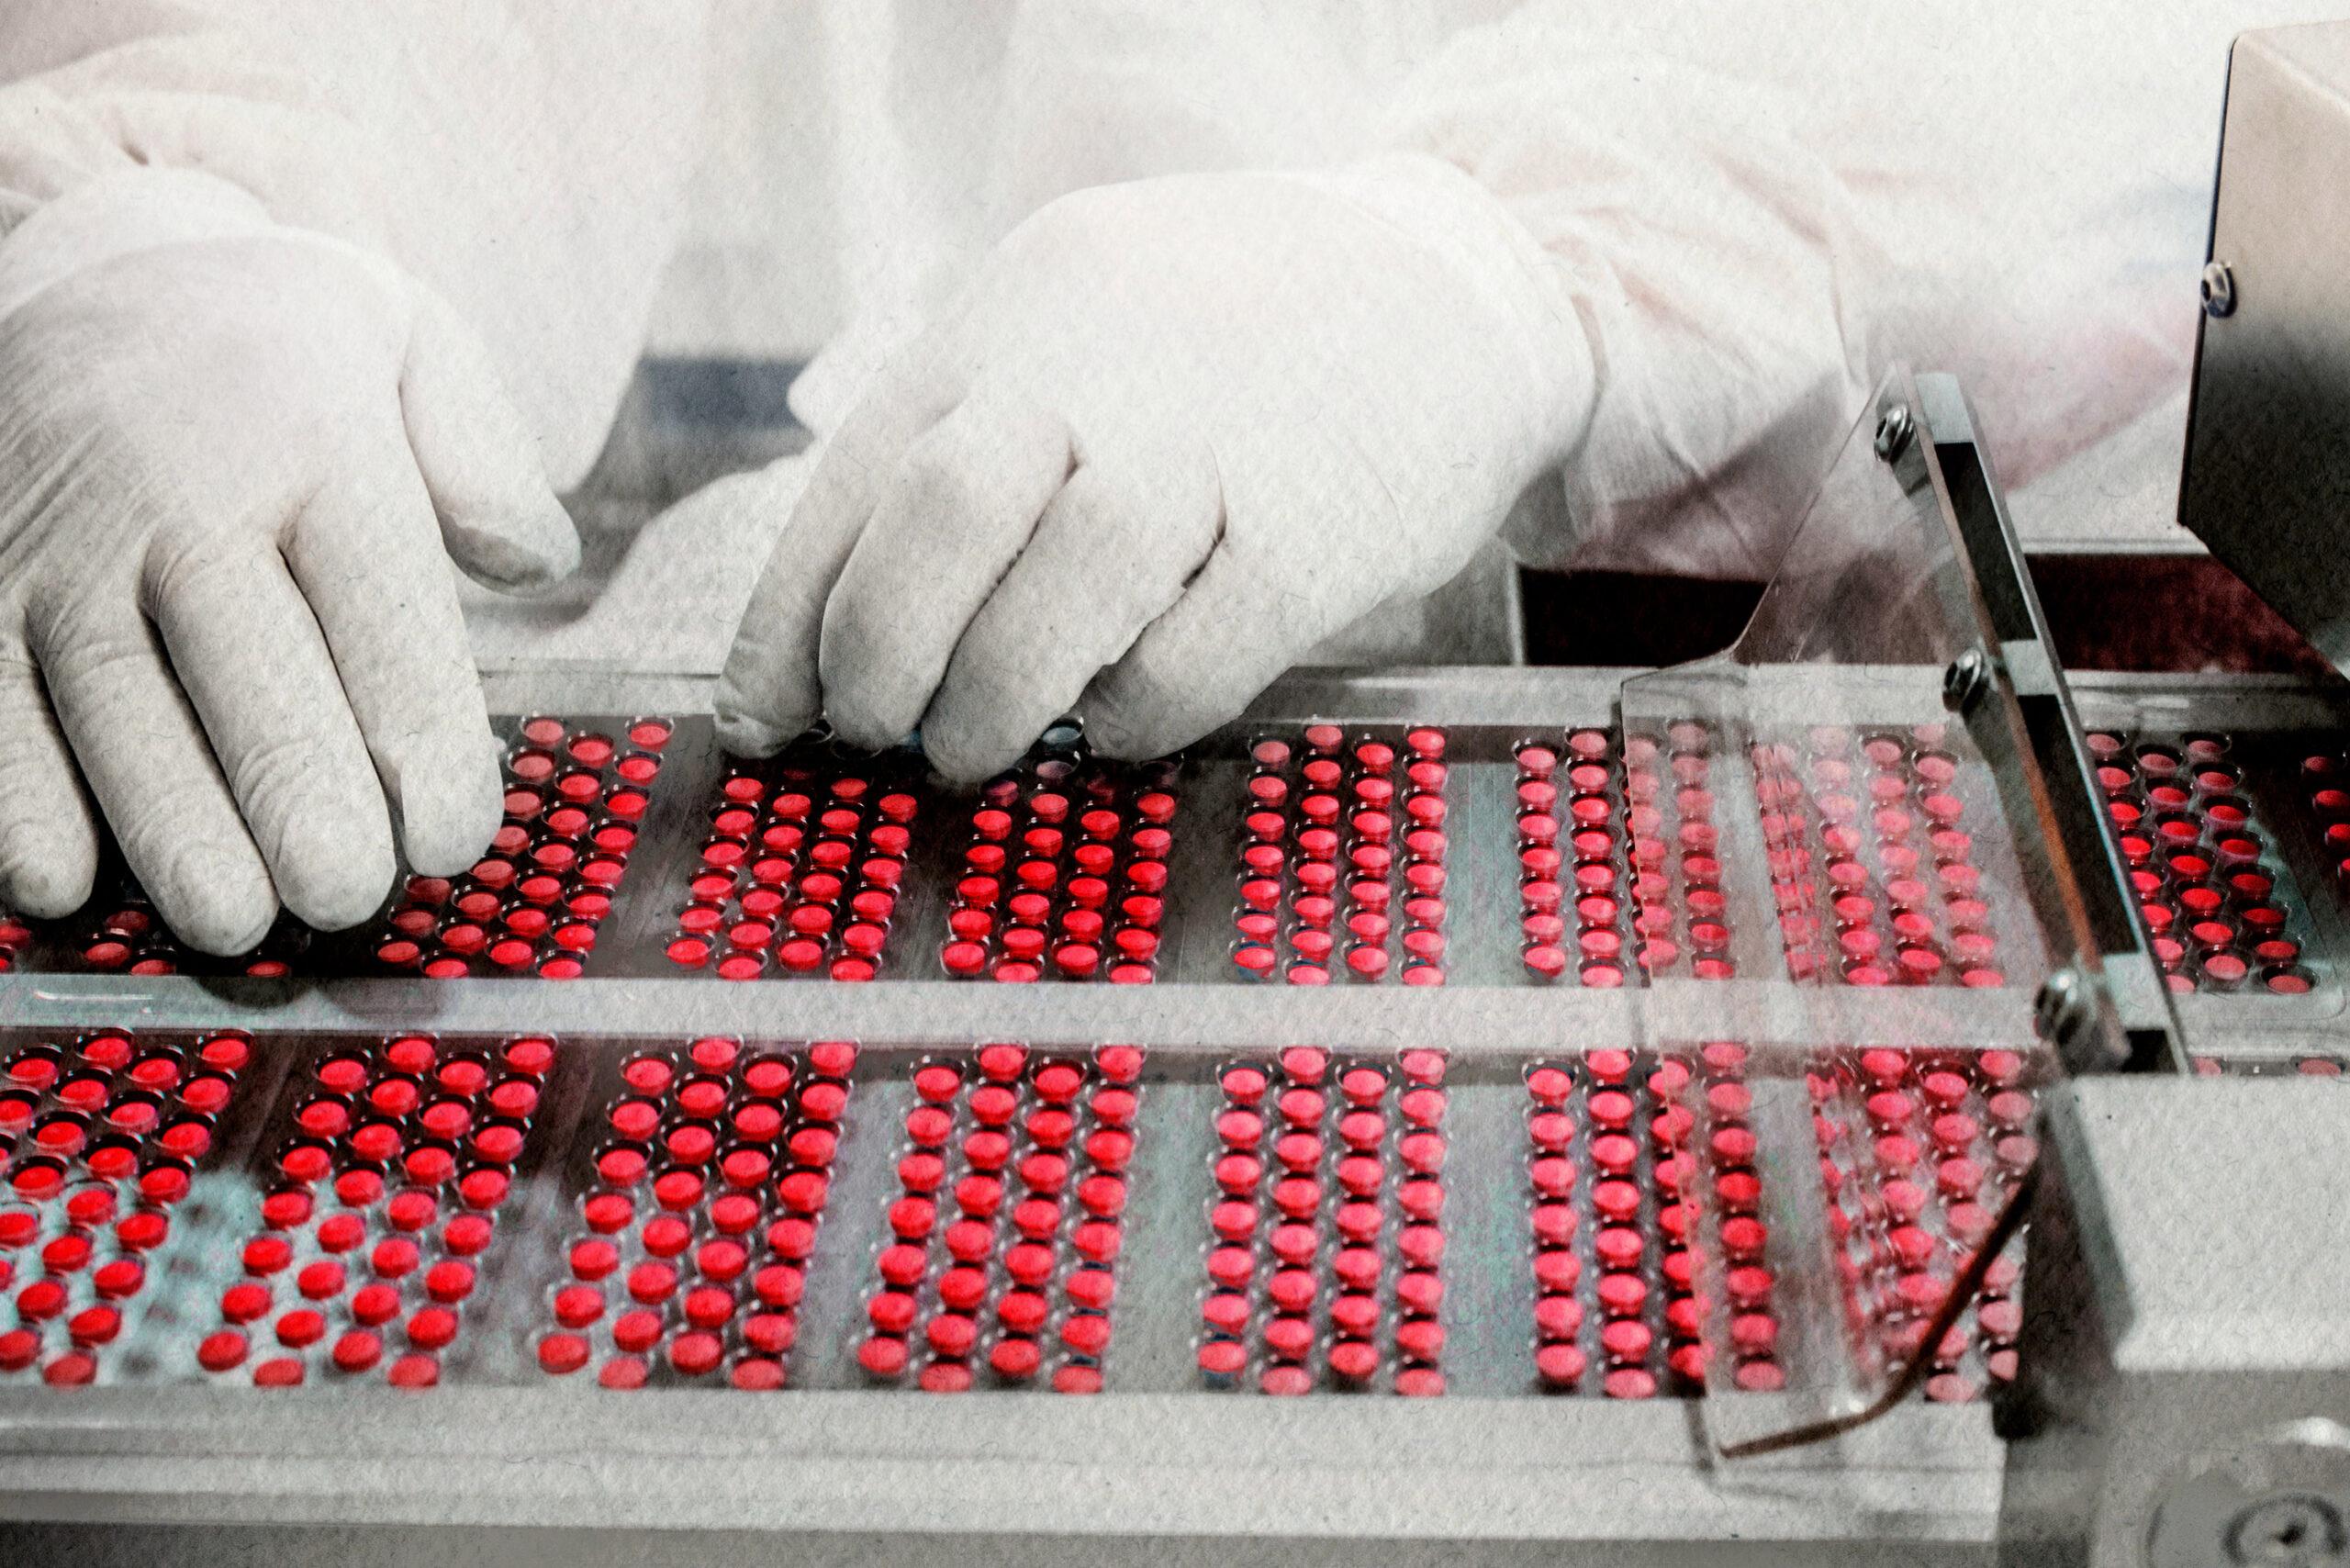 Worker inspecting pills on blisterpack conveyer belt